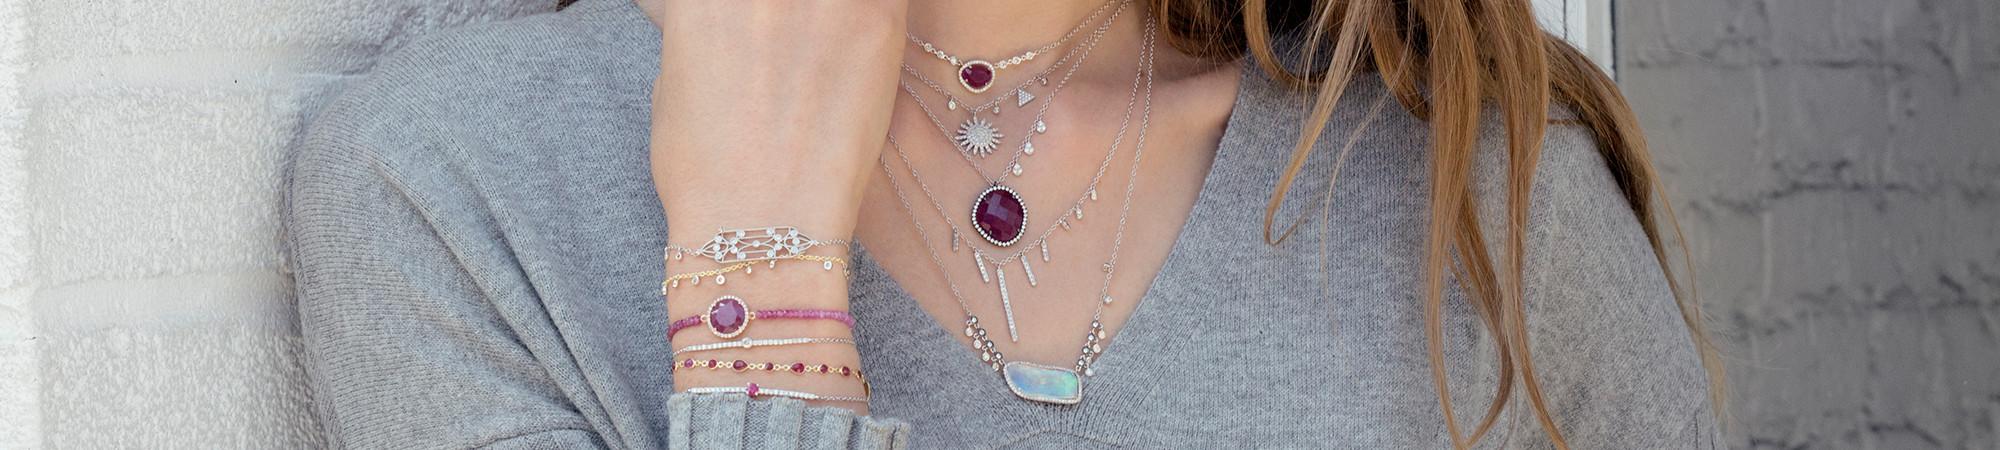 Bennion Fine Miscellaneous Jewelry in Salt Lake City UT